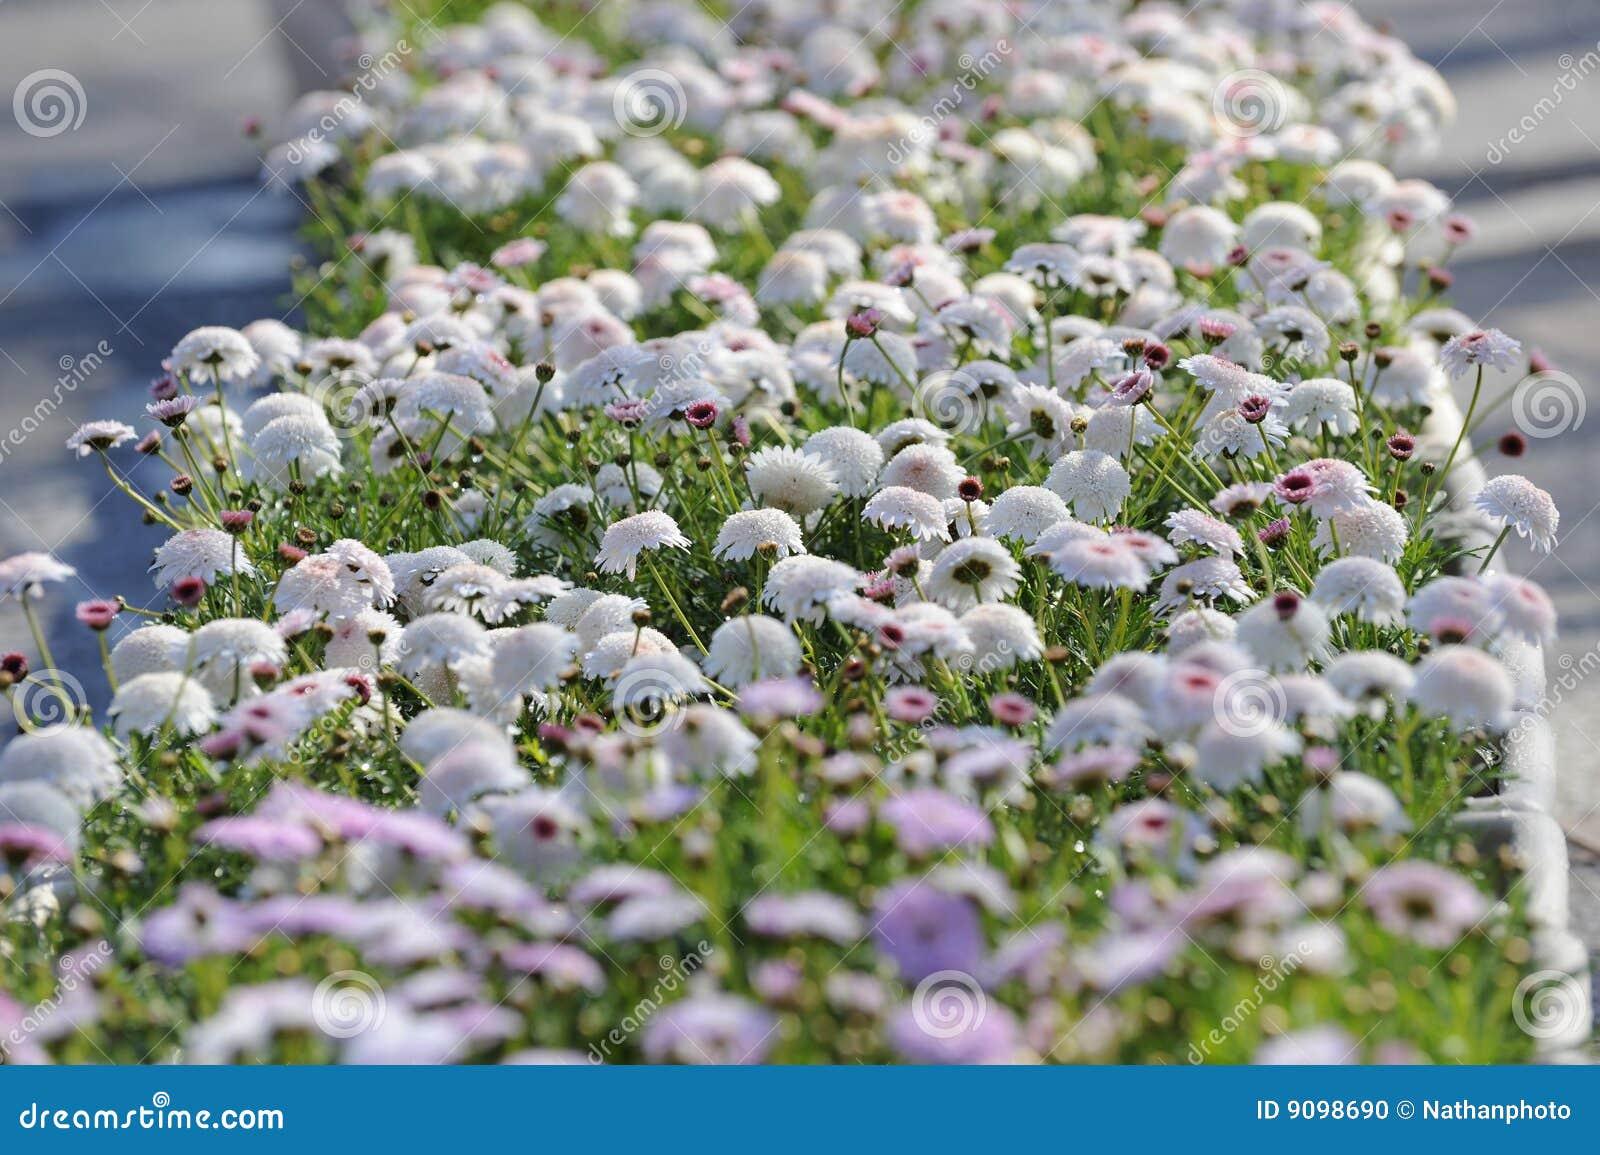 fleur blanche et rose photo stock image du t nature. Black Bedroom Furniture Sets. Home Design Ideas